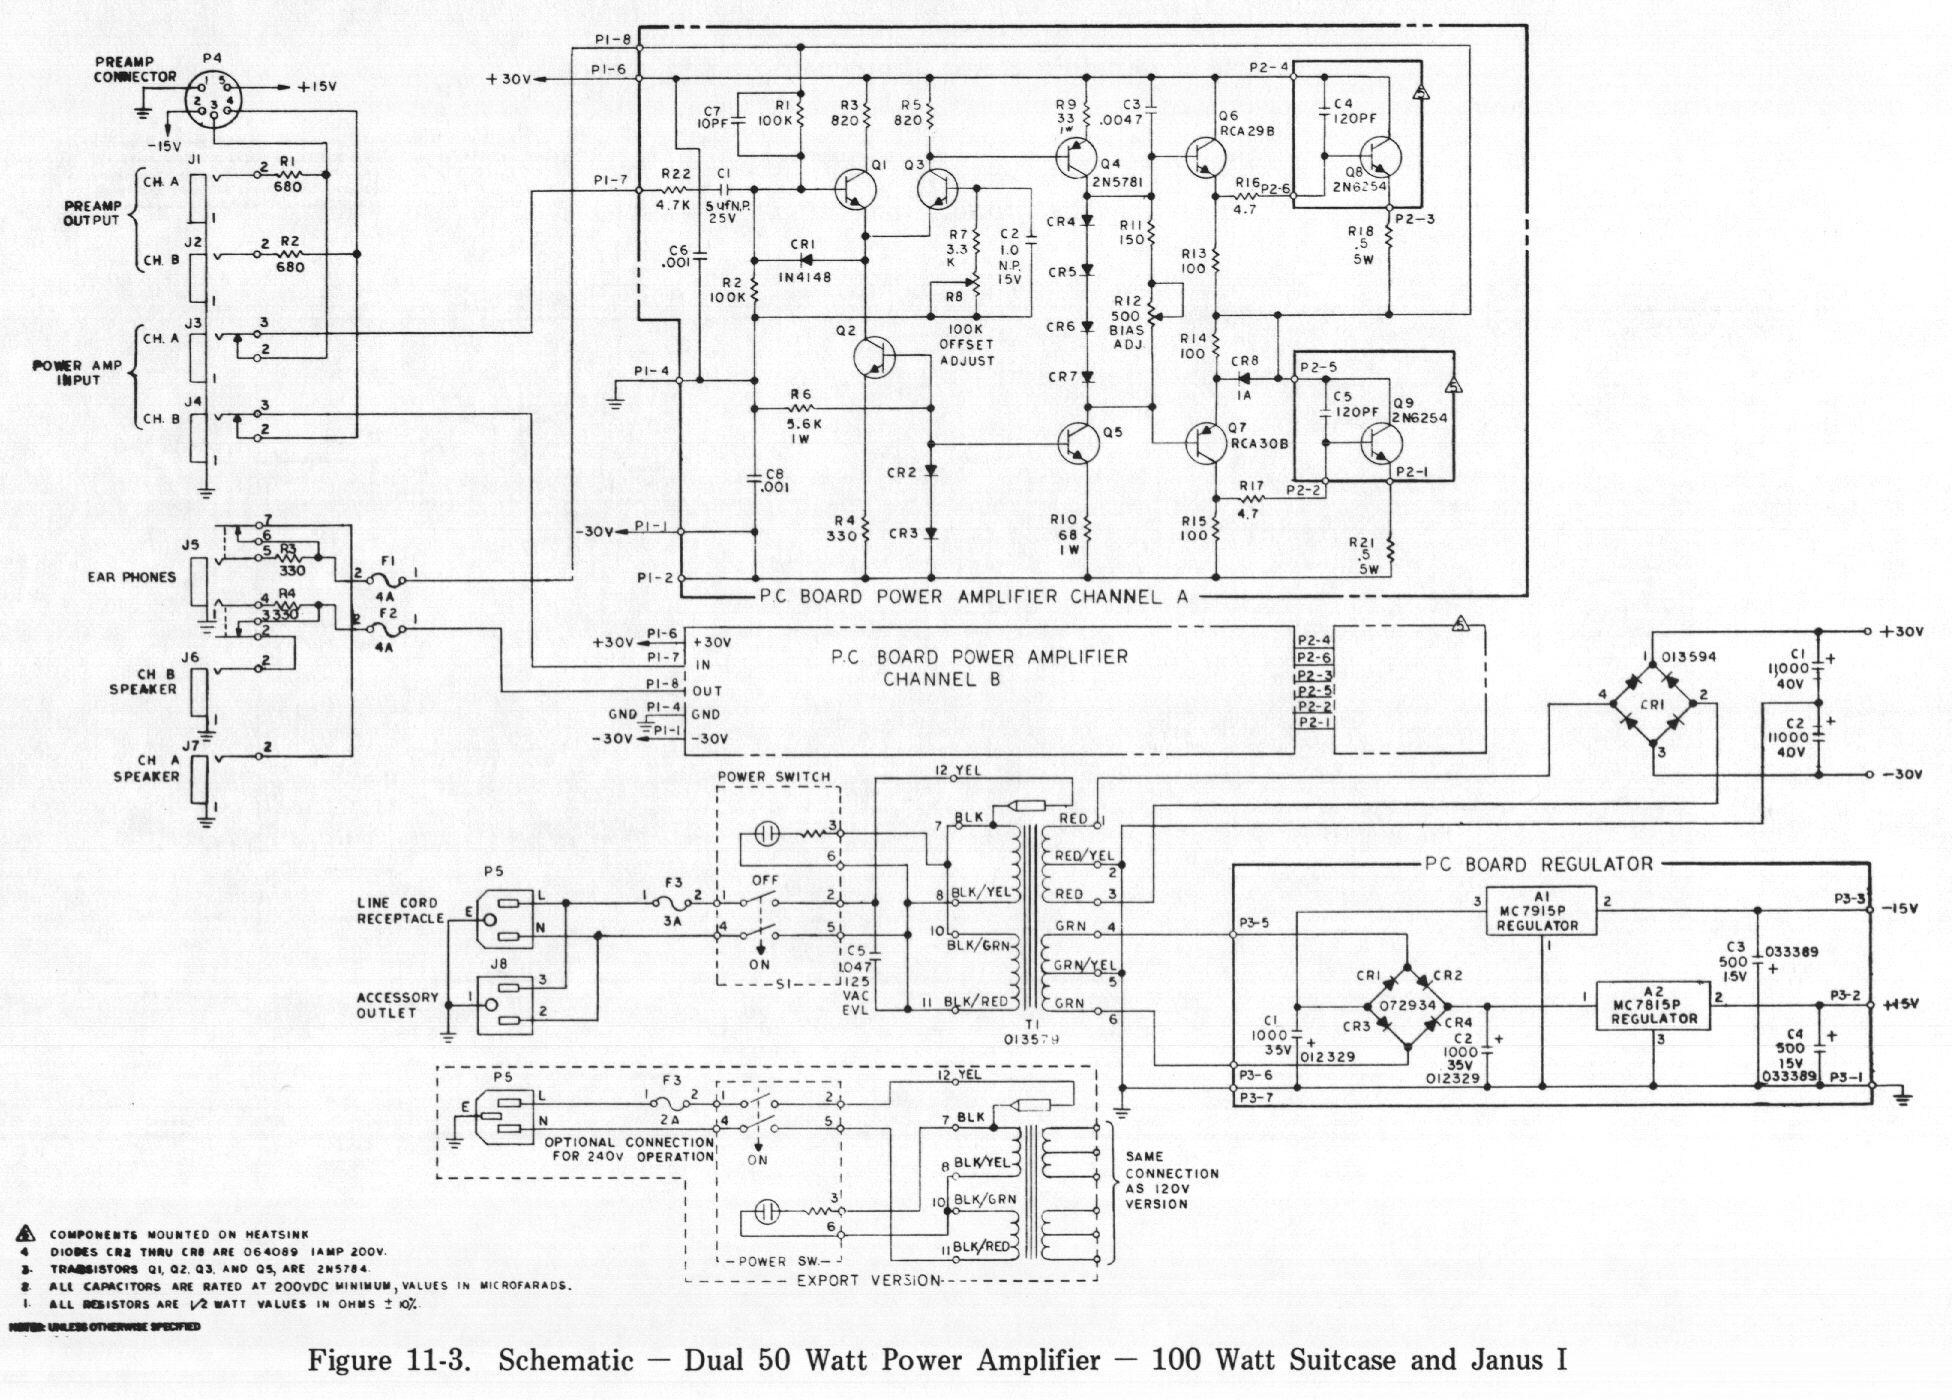 Chapter 11 Diagrams Schematics And Pictorials